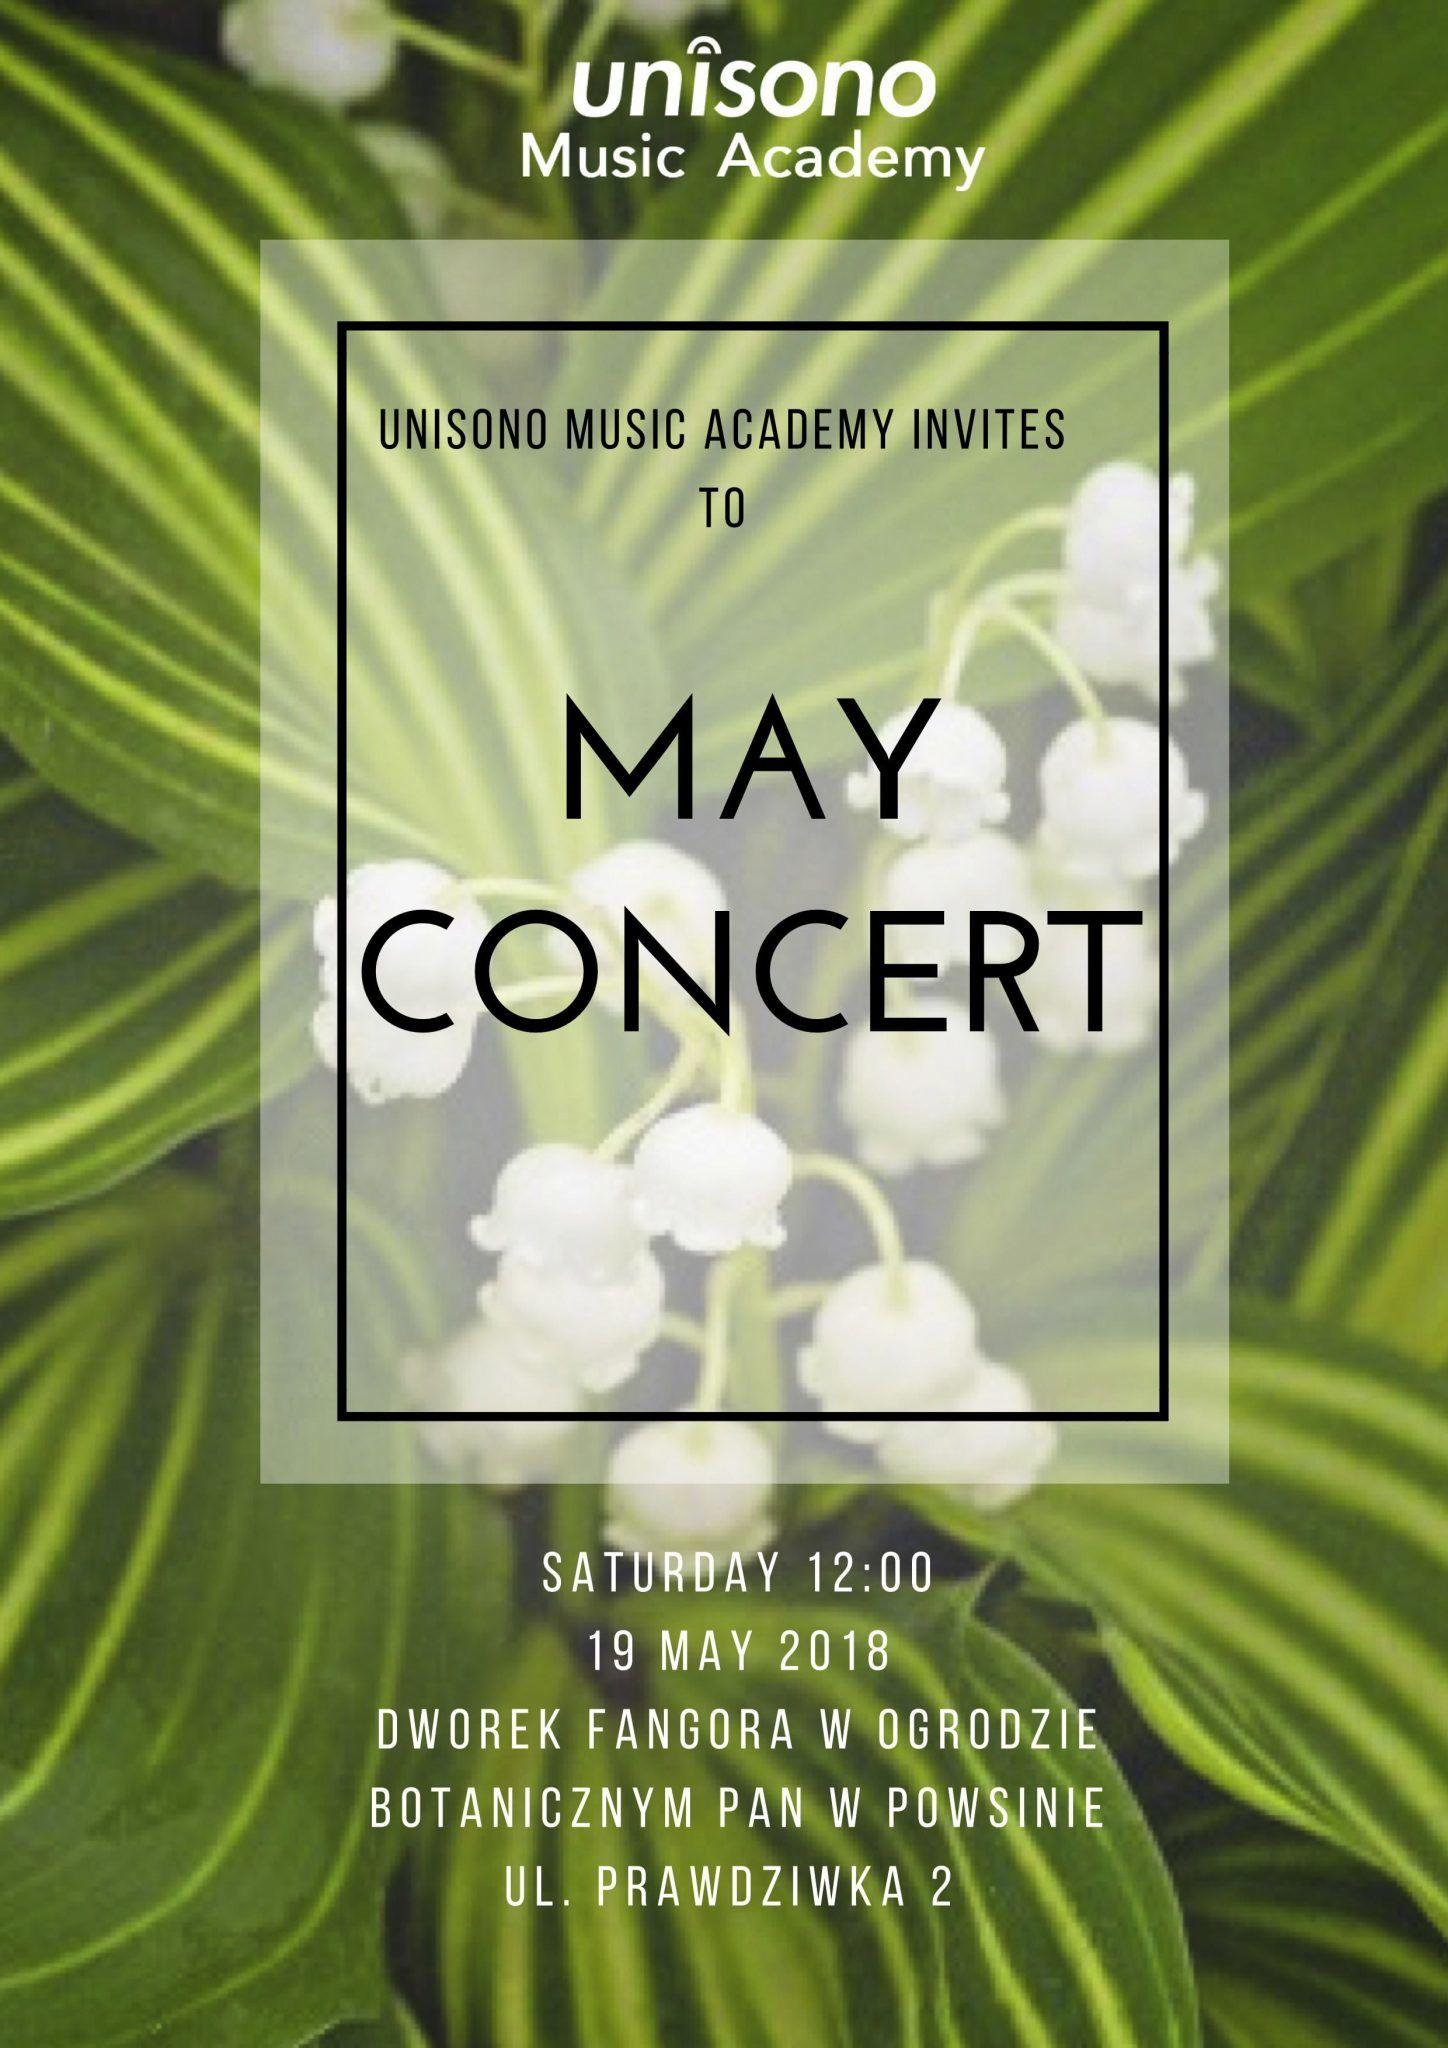 May Concert 2018 Invitation